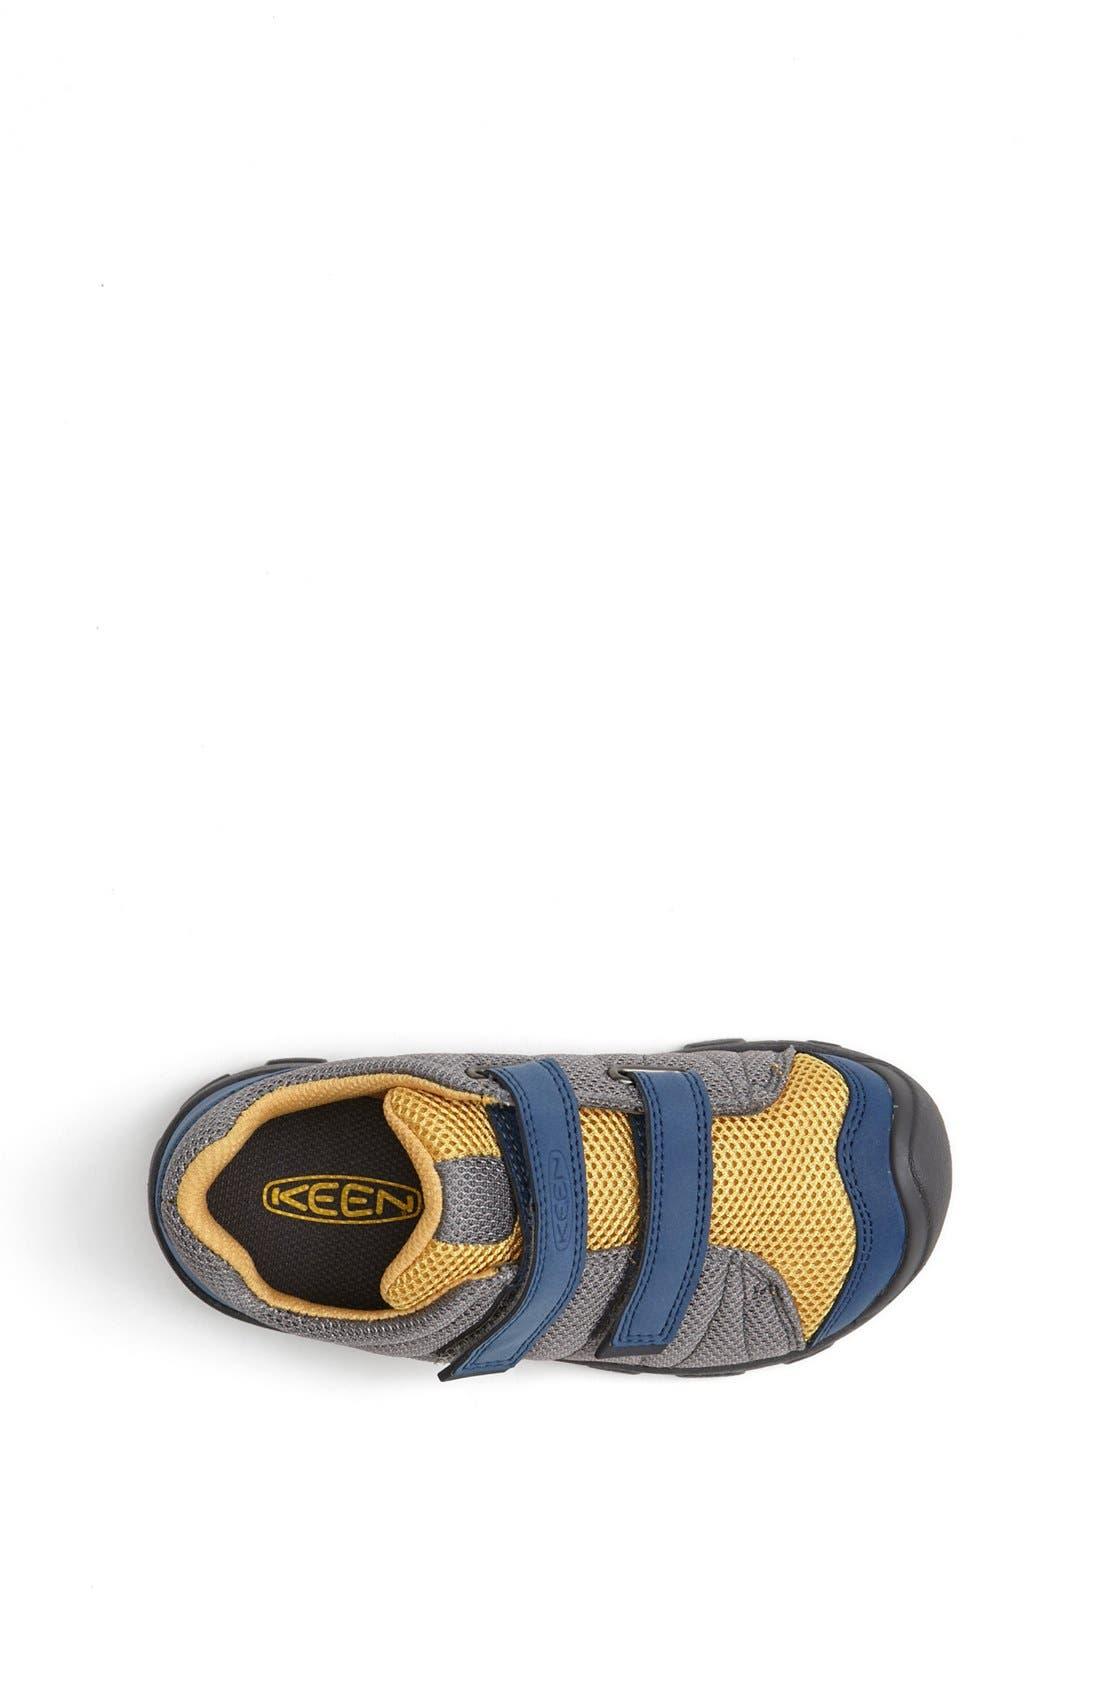 Alternate Image 3  - Keen 'Riggins' Sneaker (Baby, Walker, Toddler & Little Kid)